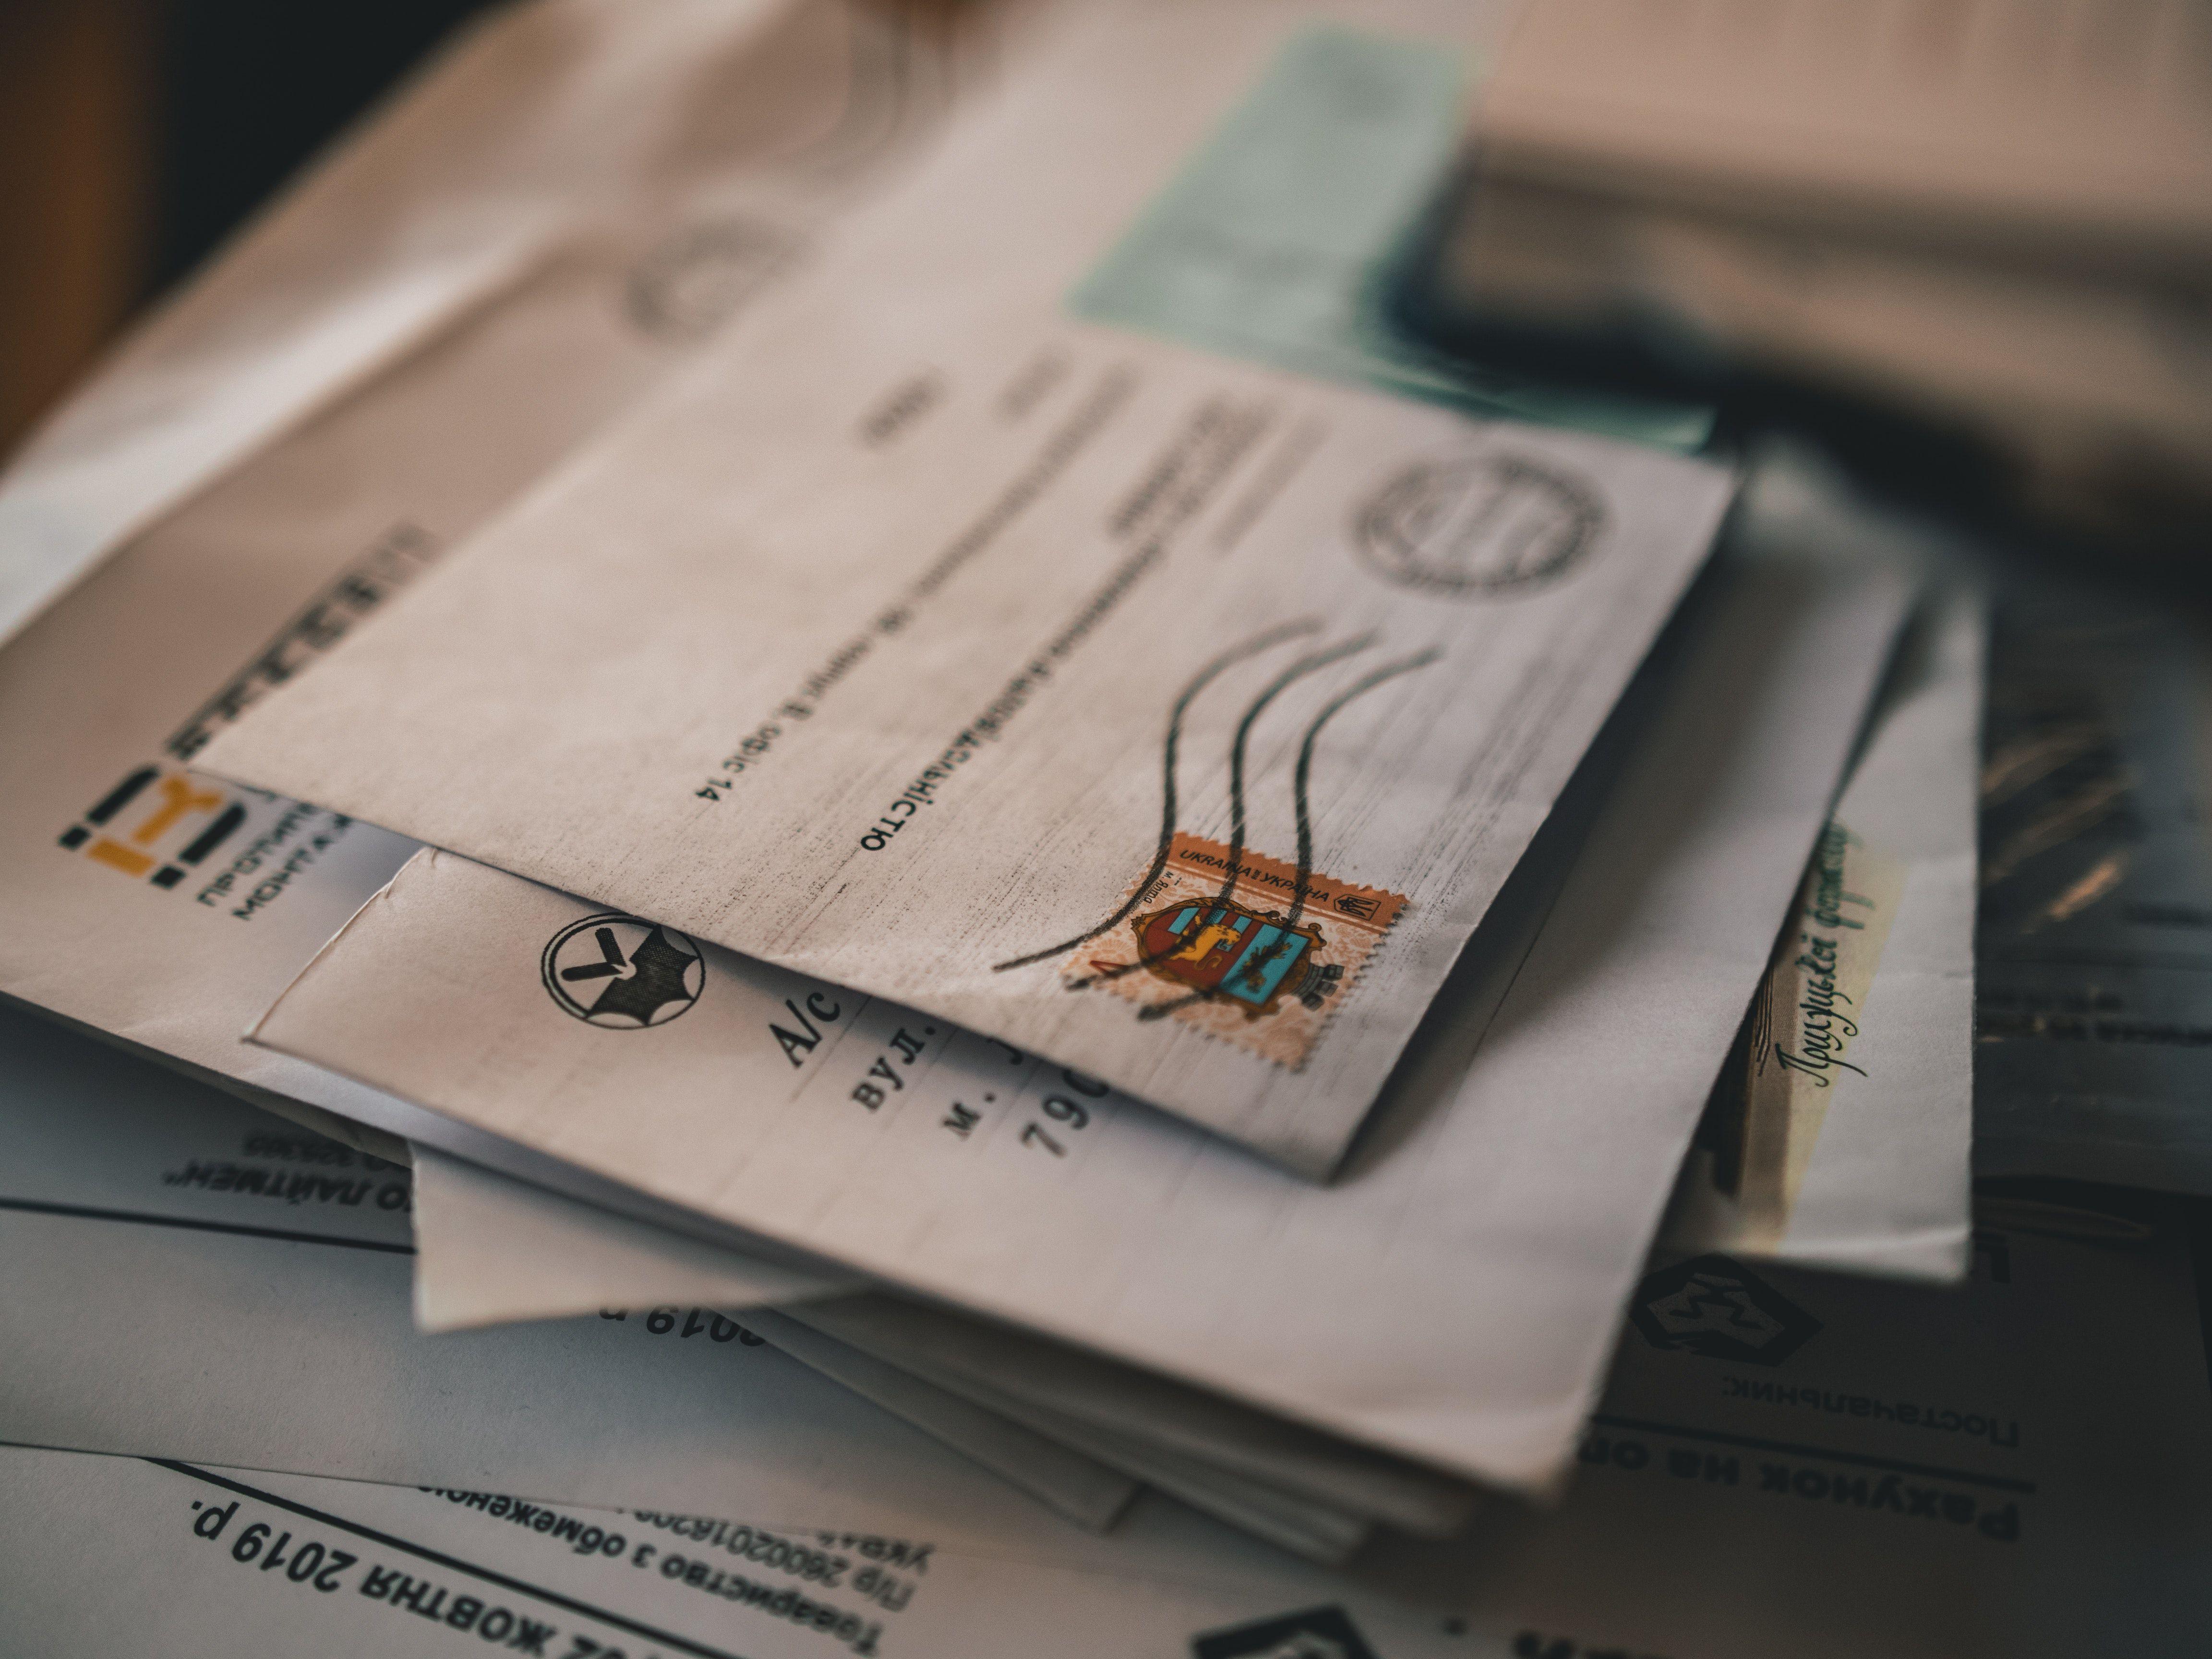 申請英國留學的條件 - Unconditional 與 Conditional Offer的差別